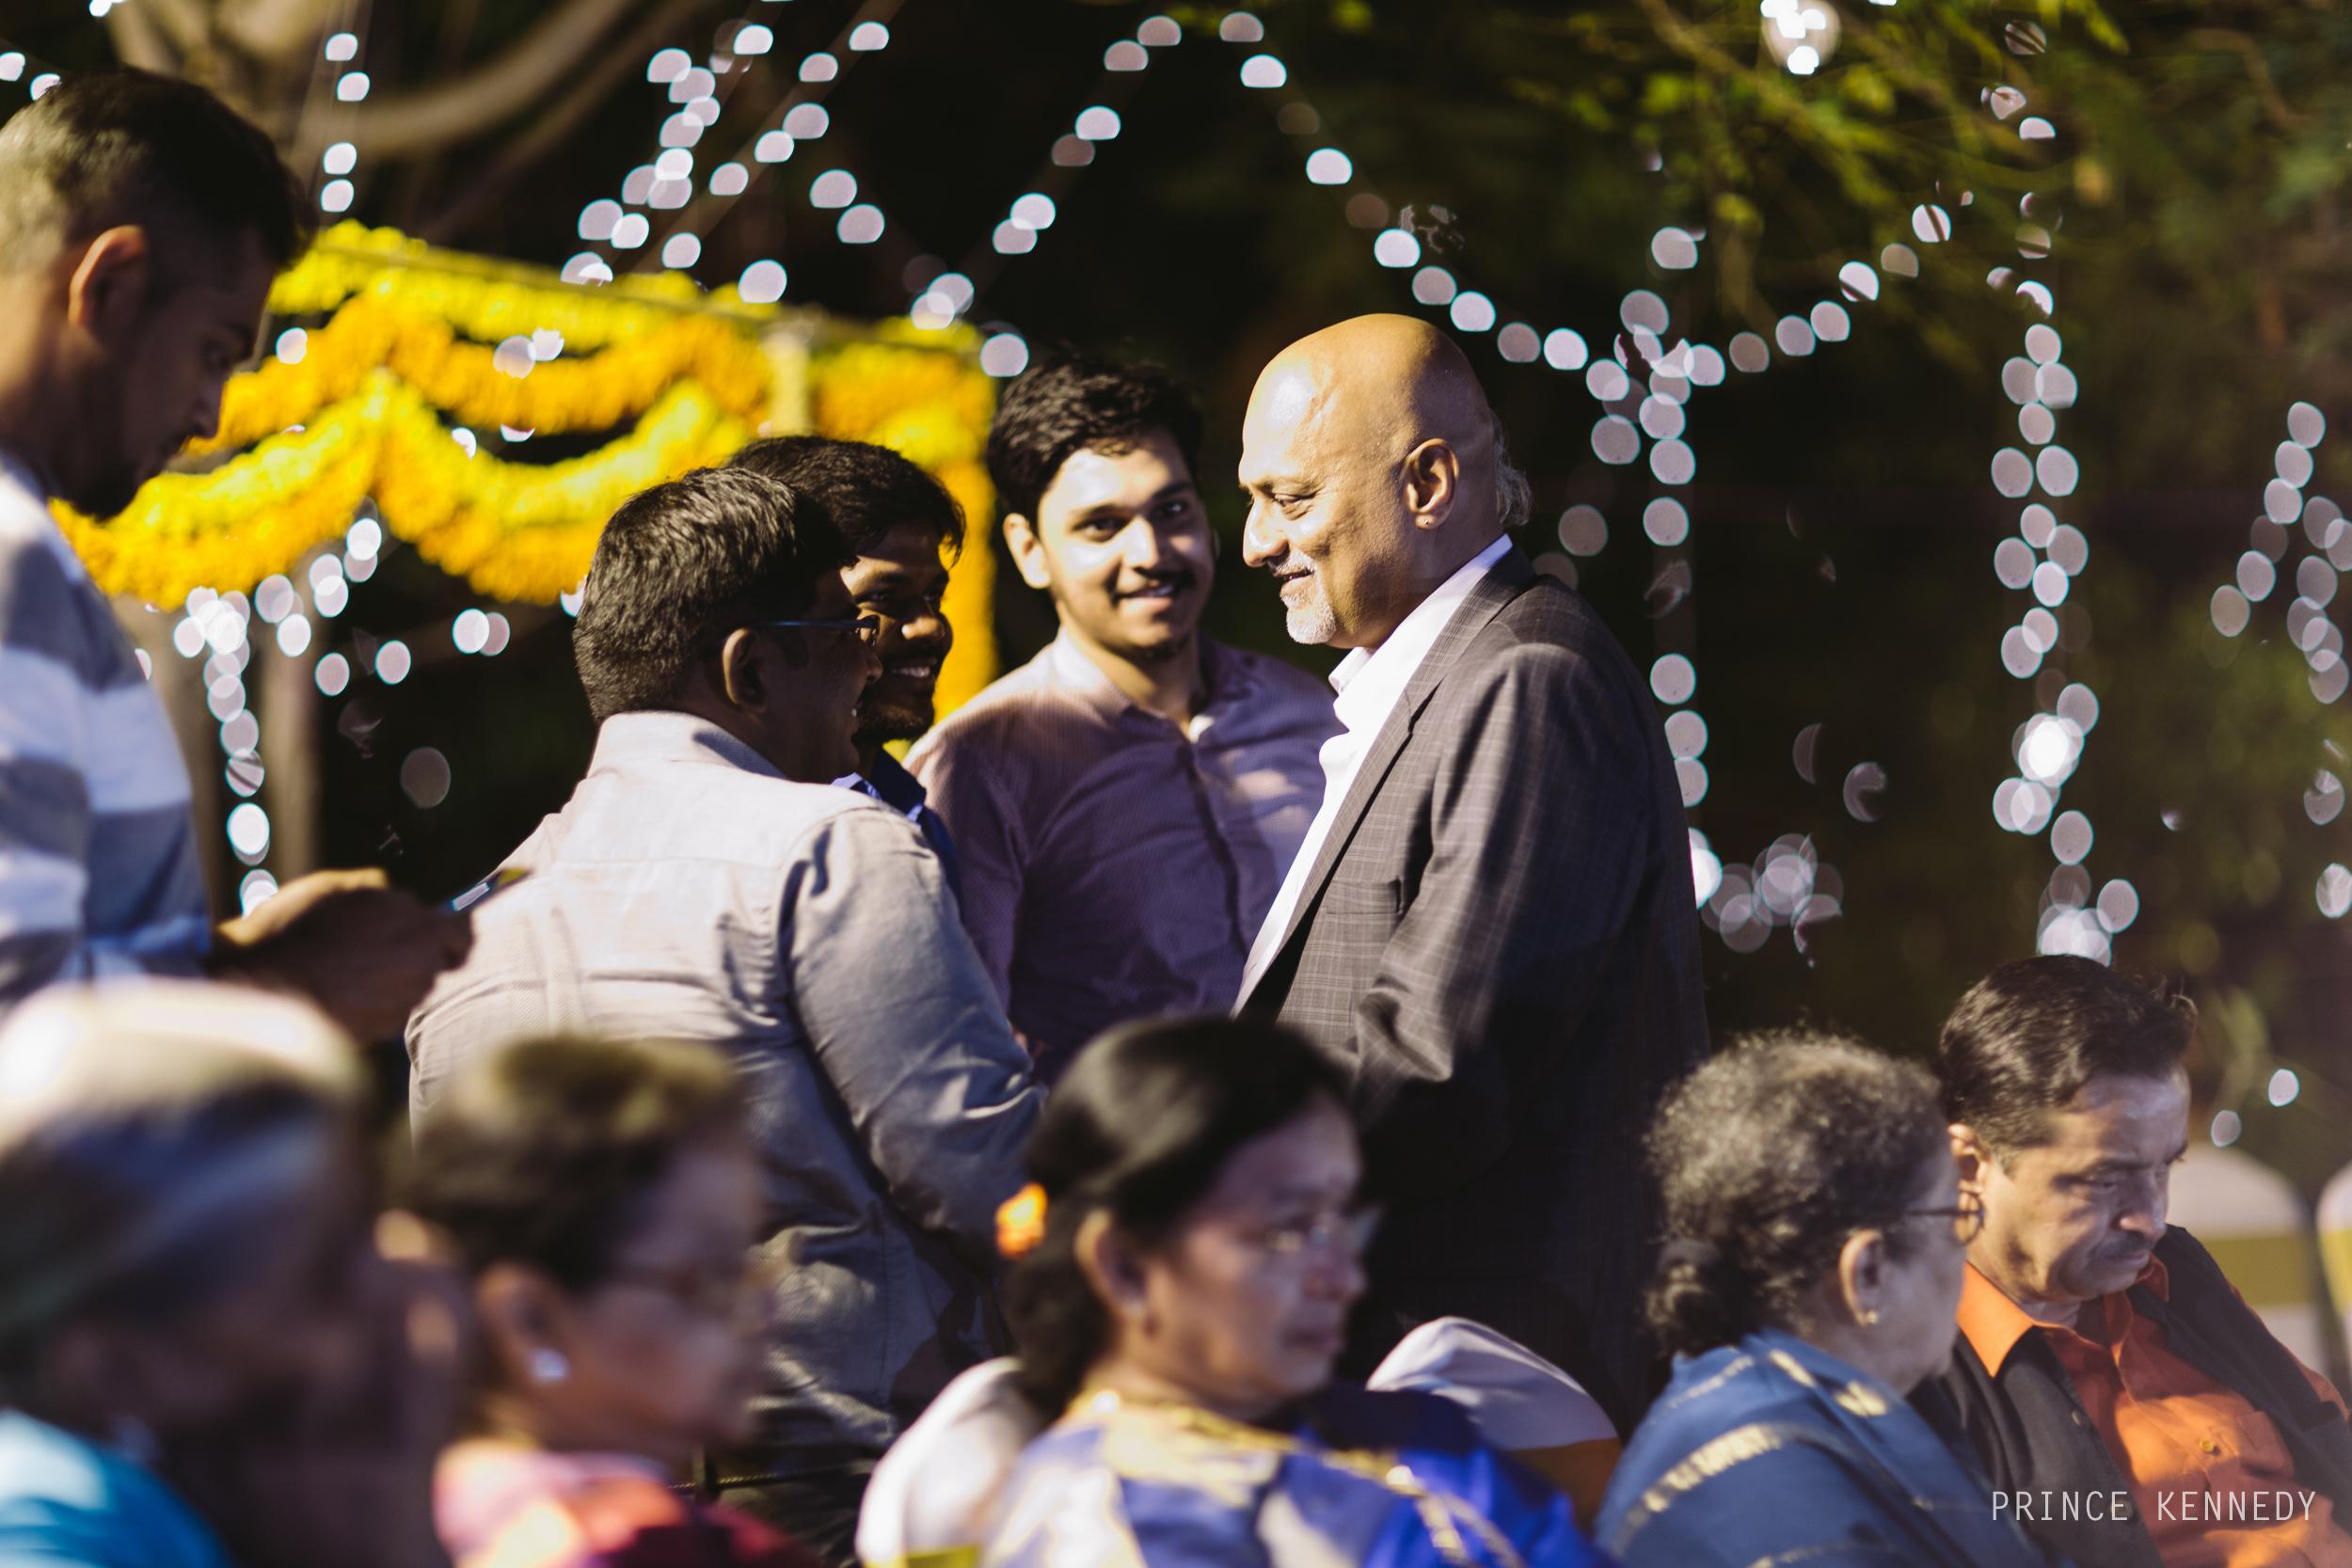 Athmajja-Nithesh-Engagement-Couple-Portrait-Portraiture-Wedding-Couple-Portrait-Chennai-Photographer-Candid-Photography-Destination-Best-Prince-Kennedy-Photography-138.jpg